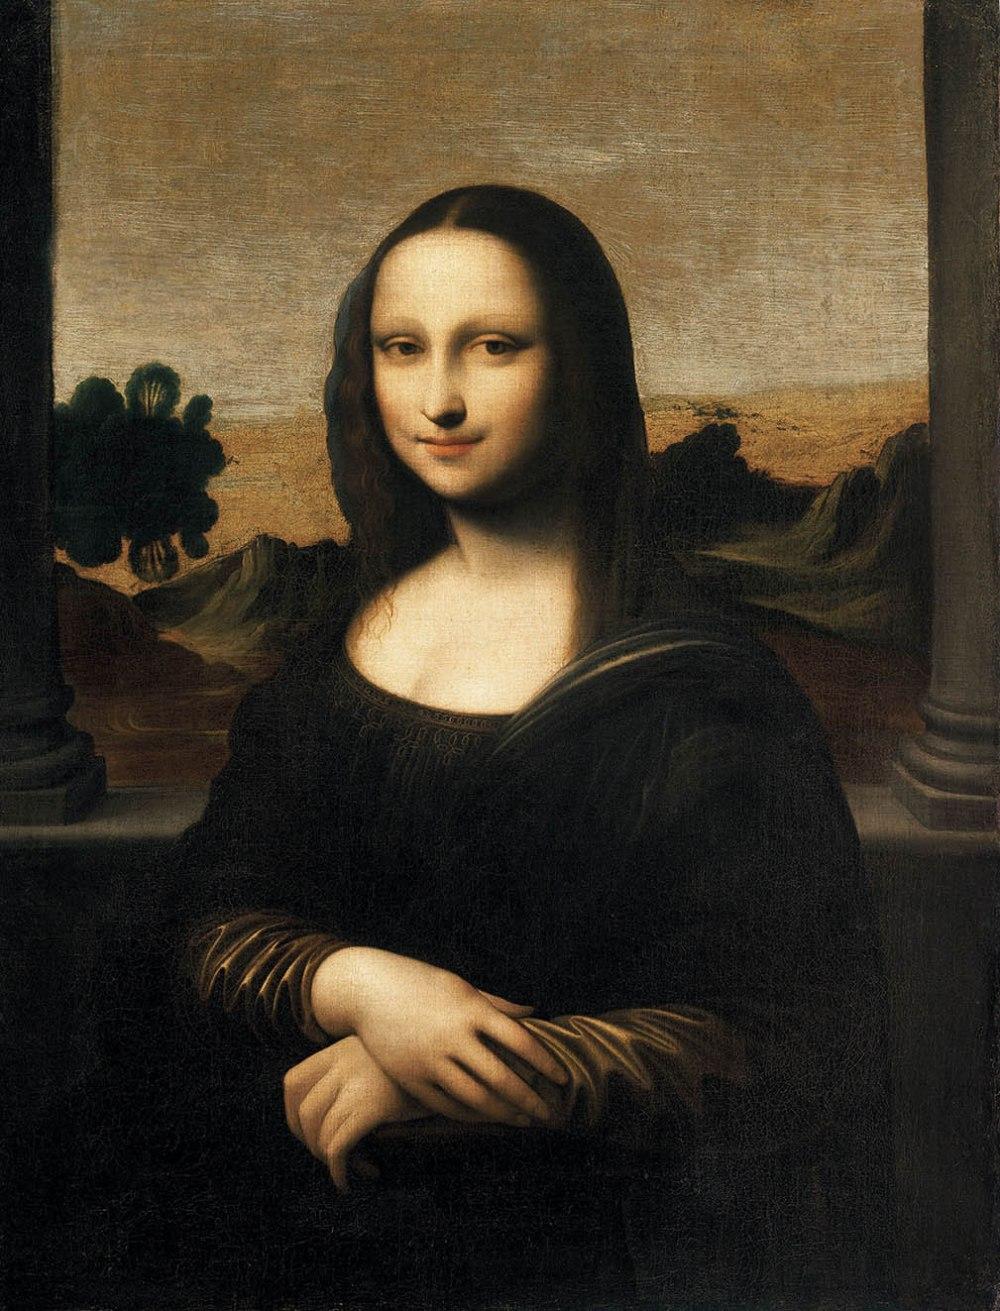 Anónimo (Atribuído a Leonardo da Vinci).  Mona Lisa de Isleworth. 1410-1455.  Colección Particular.